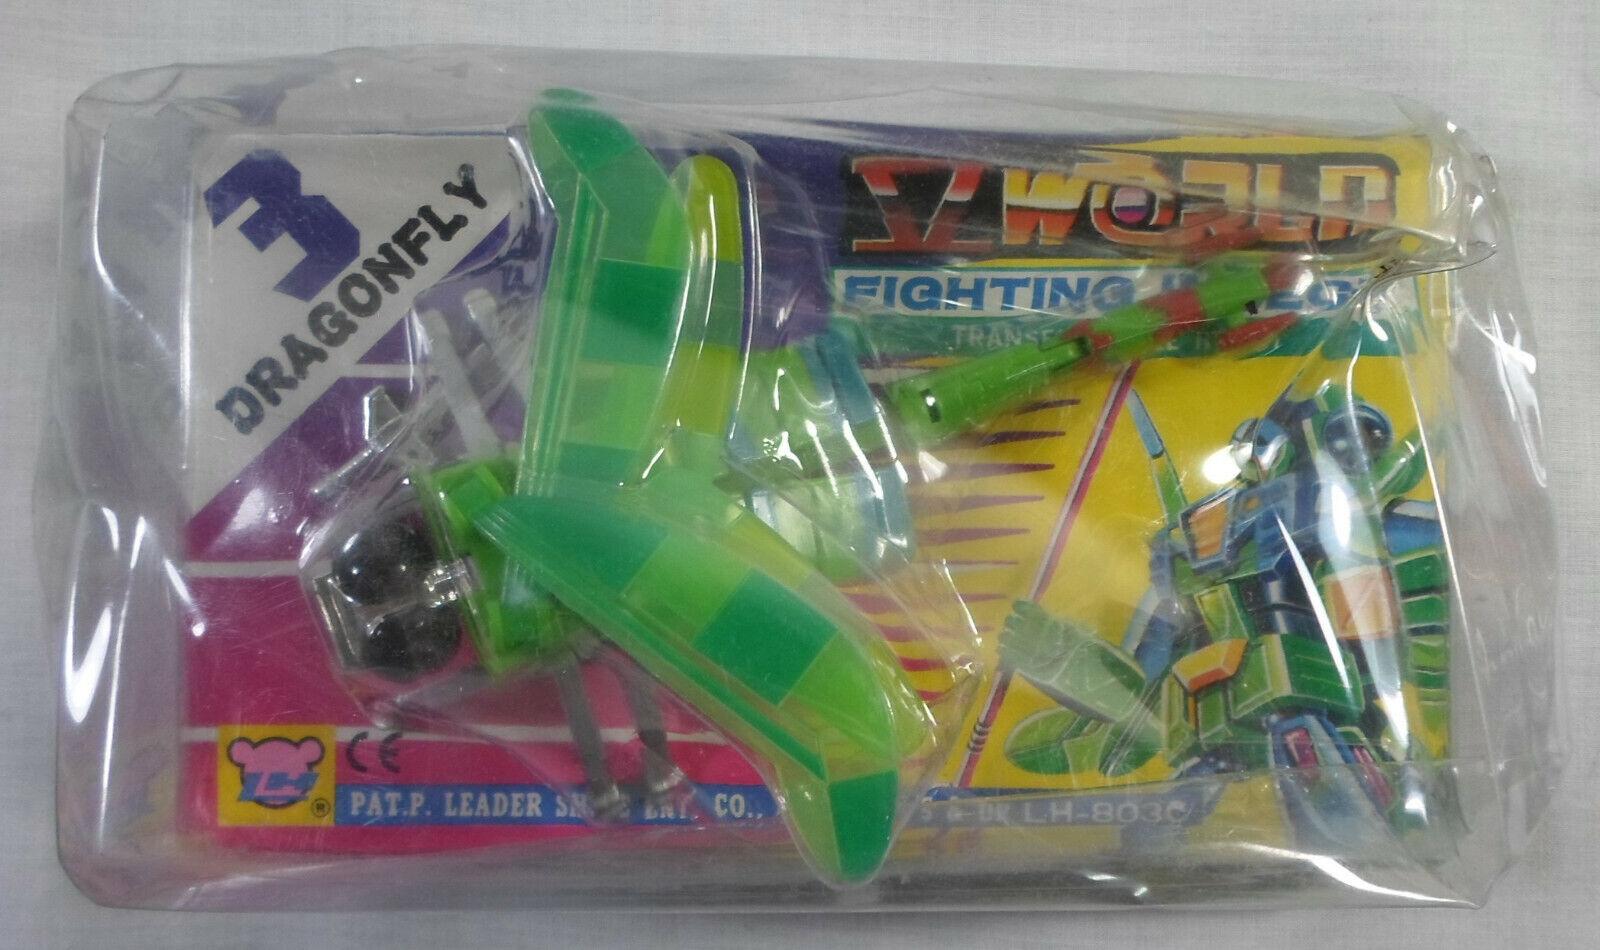 LH VTG 80's V WORLD FIGHTING INSECT 3 - DRAGONFLY TRANSFORMER ROBOT MISP SEALED